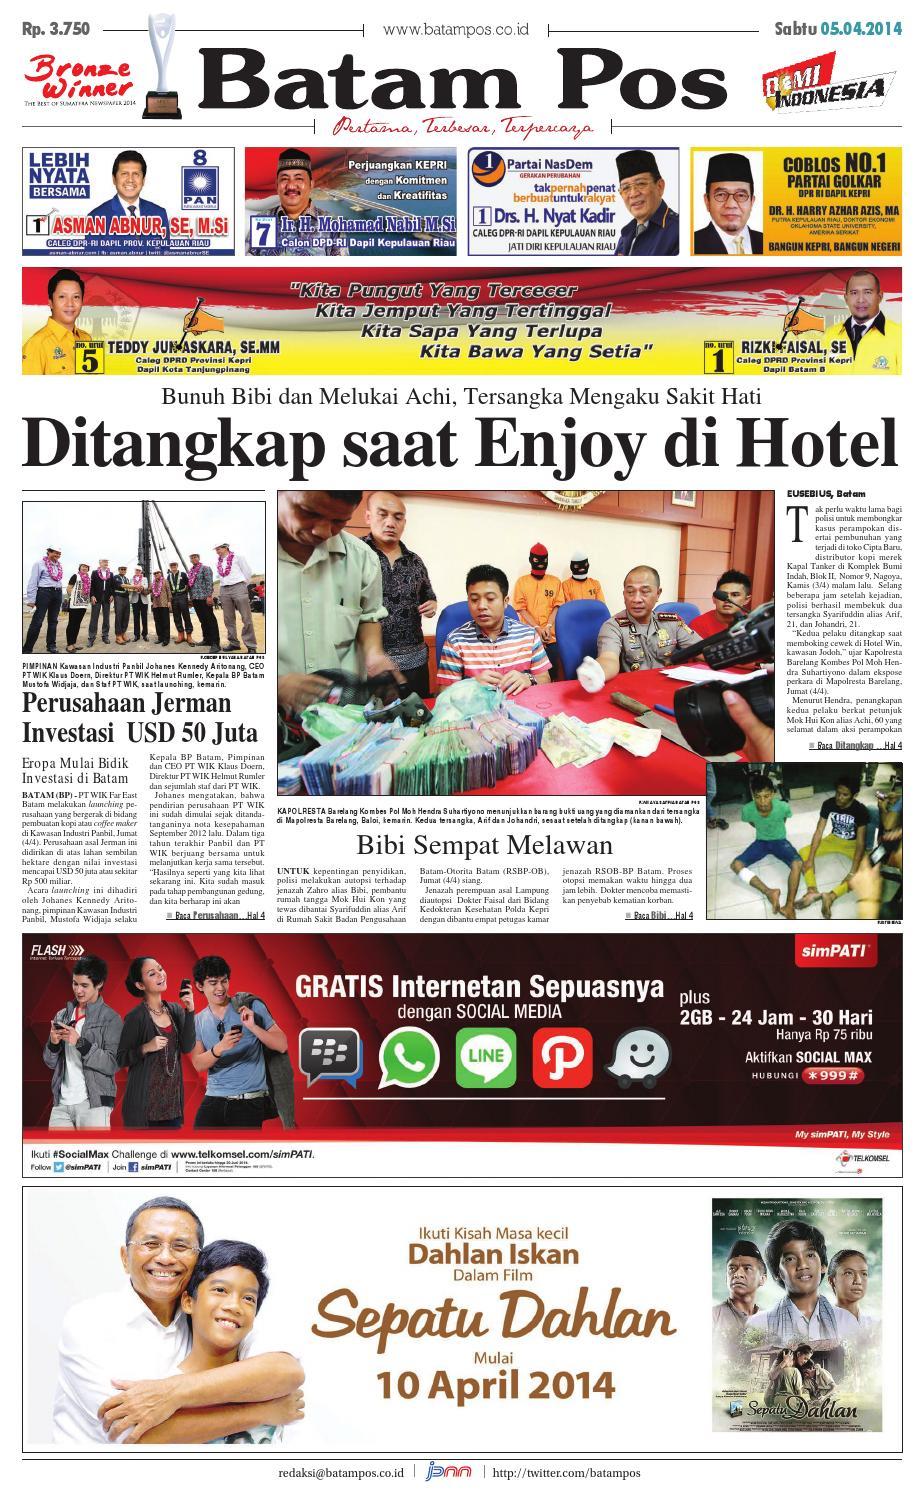 5 April 2014 By Batampos Newspaper Issuu Produk Ukm Bumn Bunge Tanjung Betabur